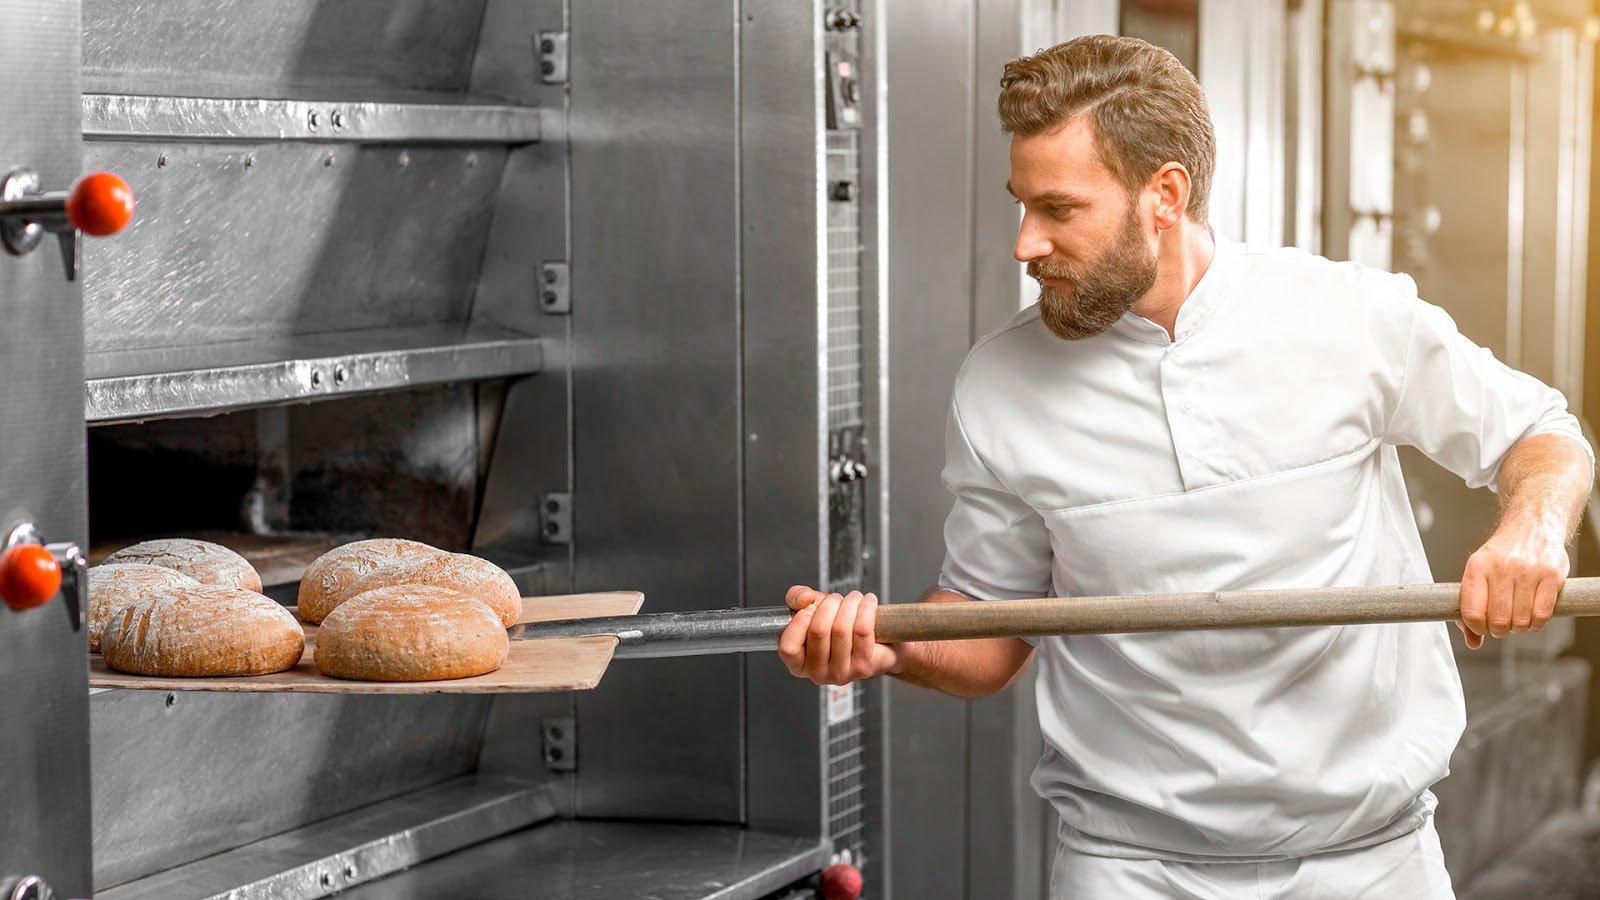 Quiero ser panadero profesional